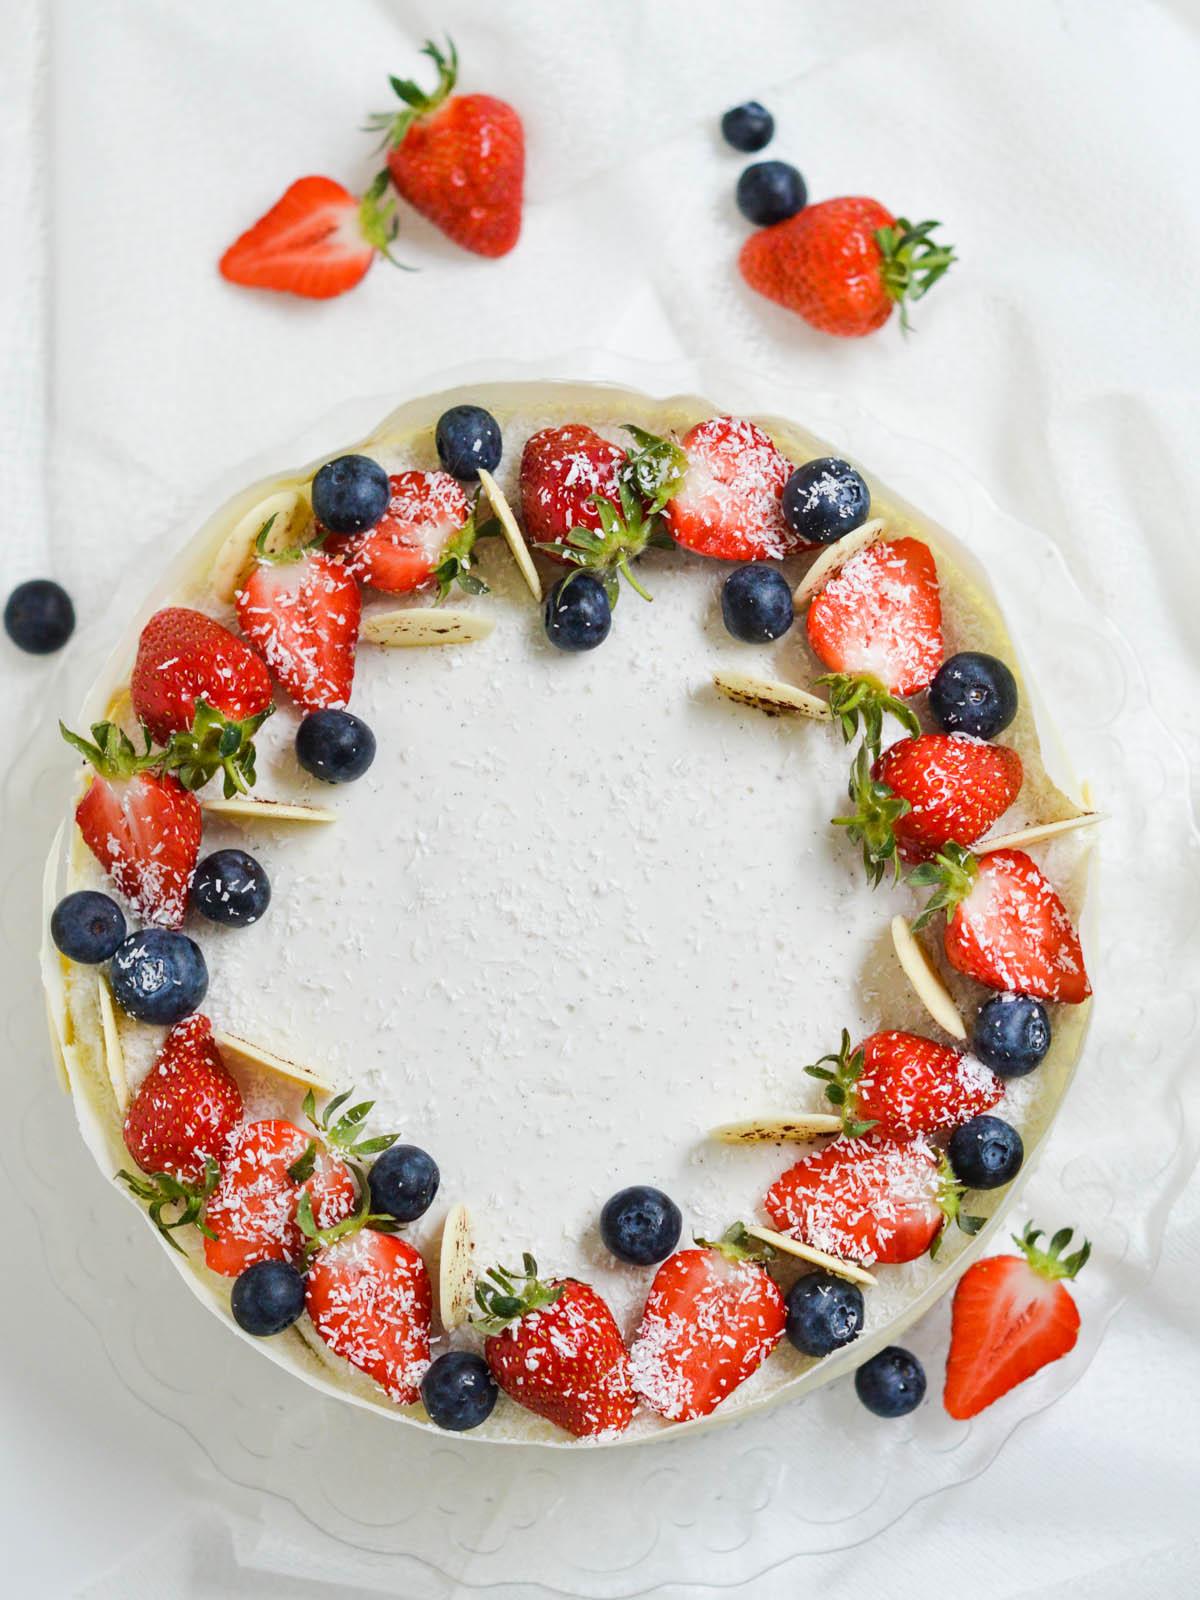 mousse torta s jagodama i kokosom (5)